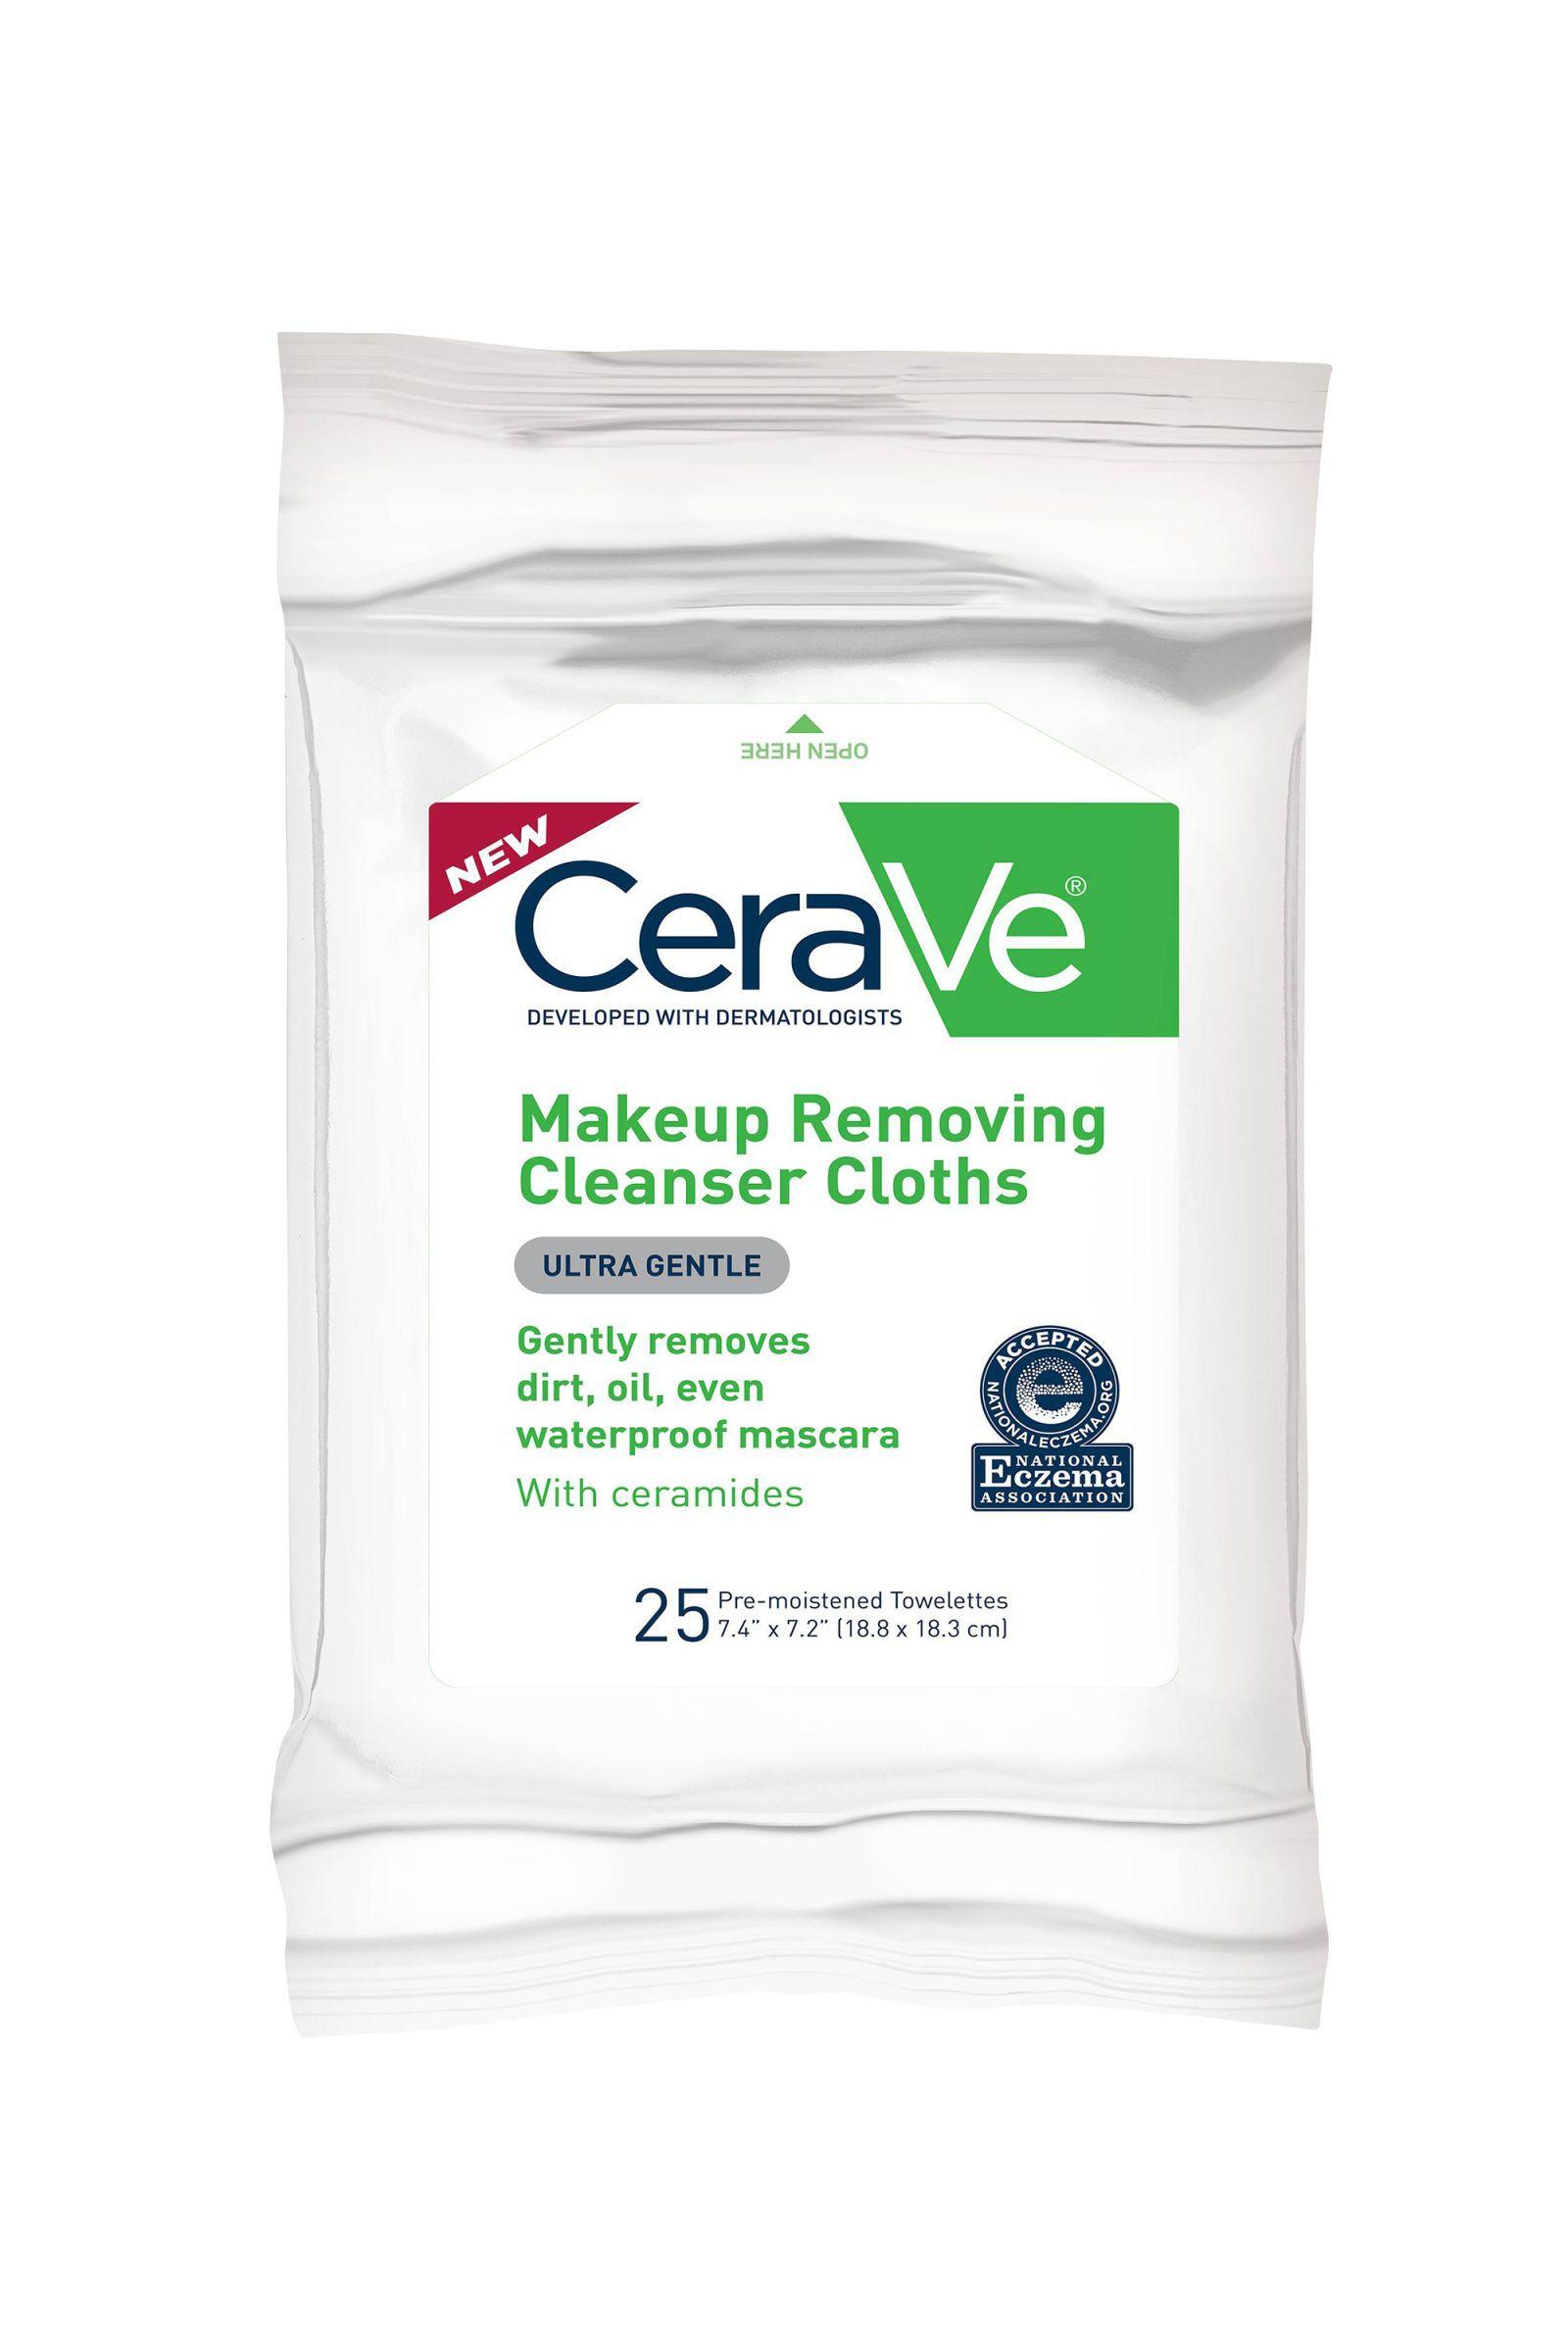 Vitamin C Brightening Glow Micellar Wipes Makeup remover